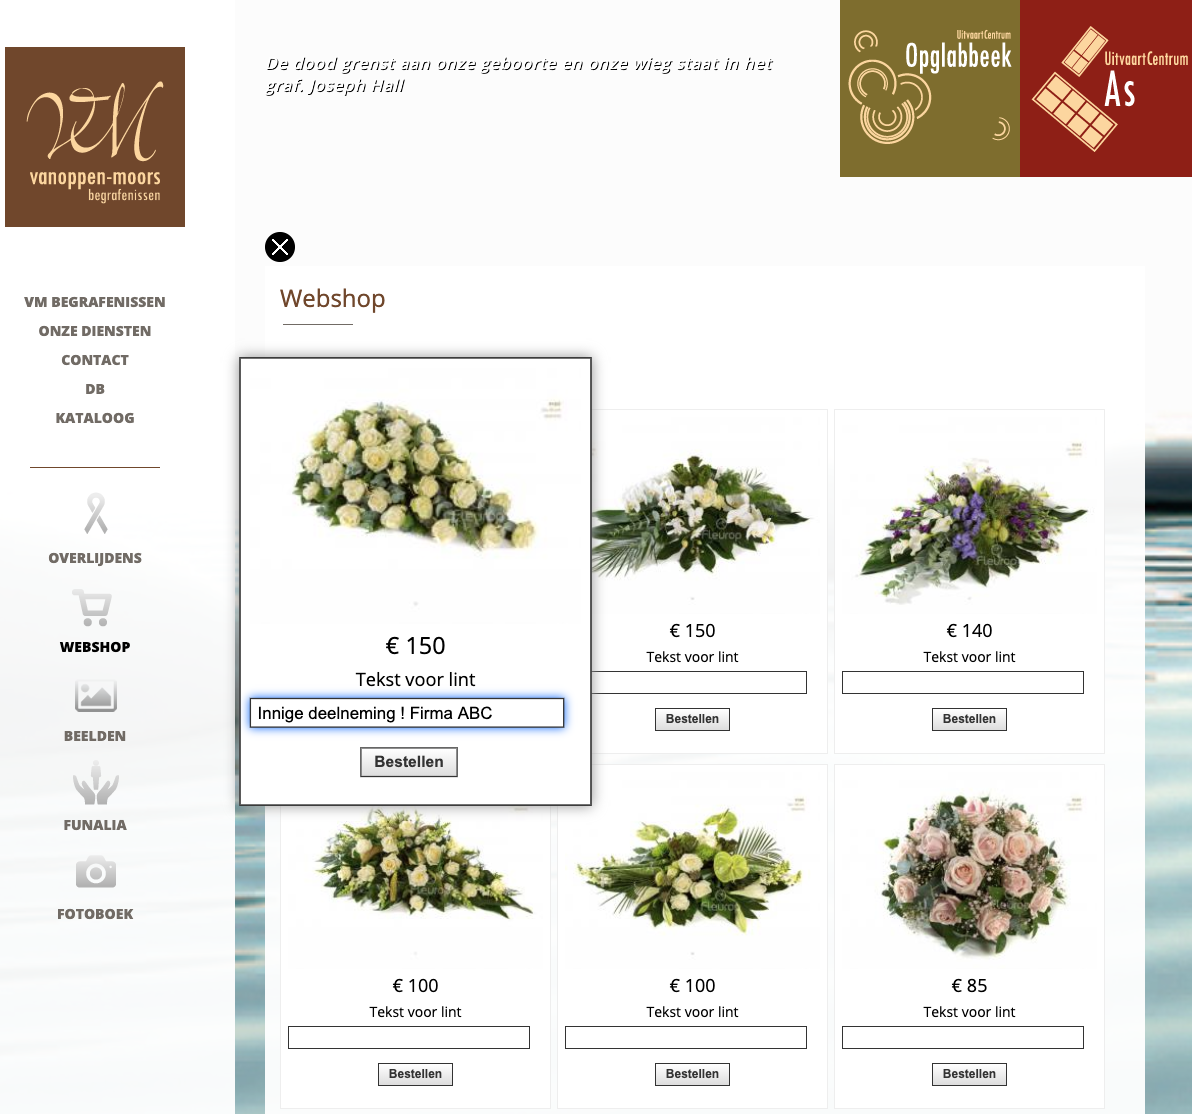 VM Begrafenissen webshop